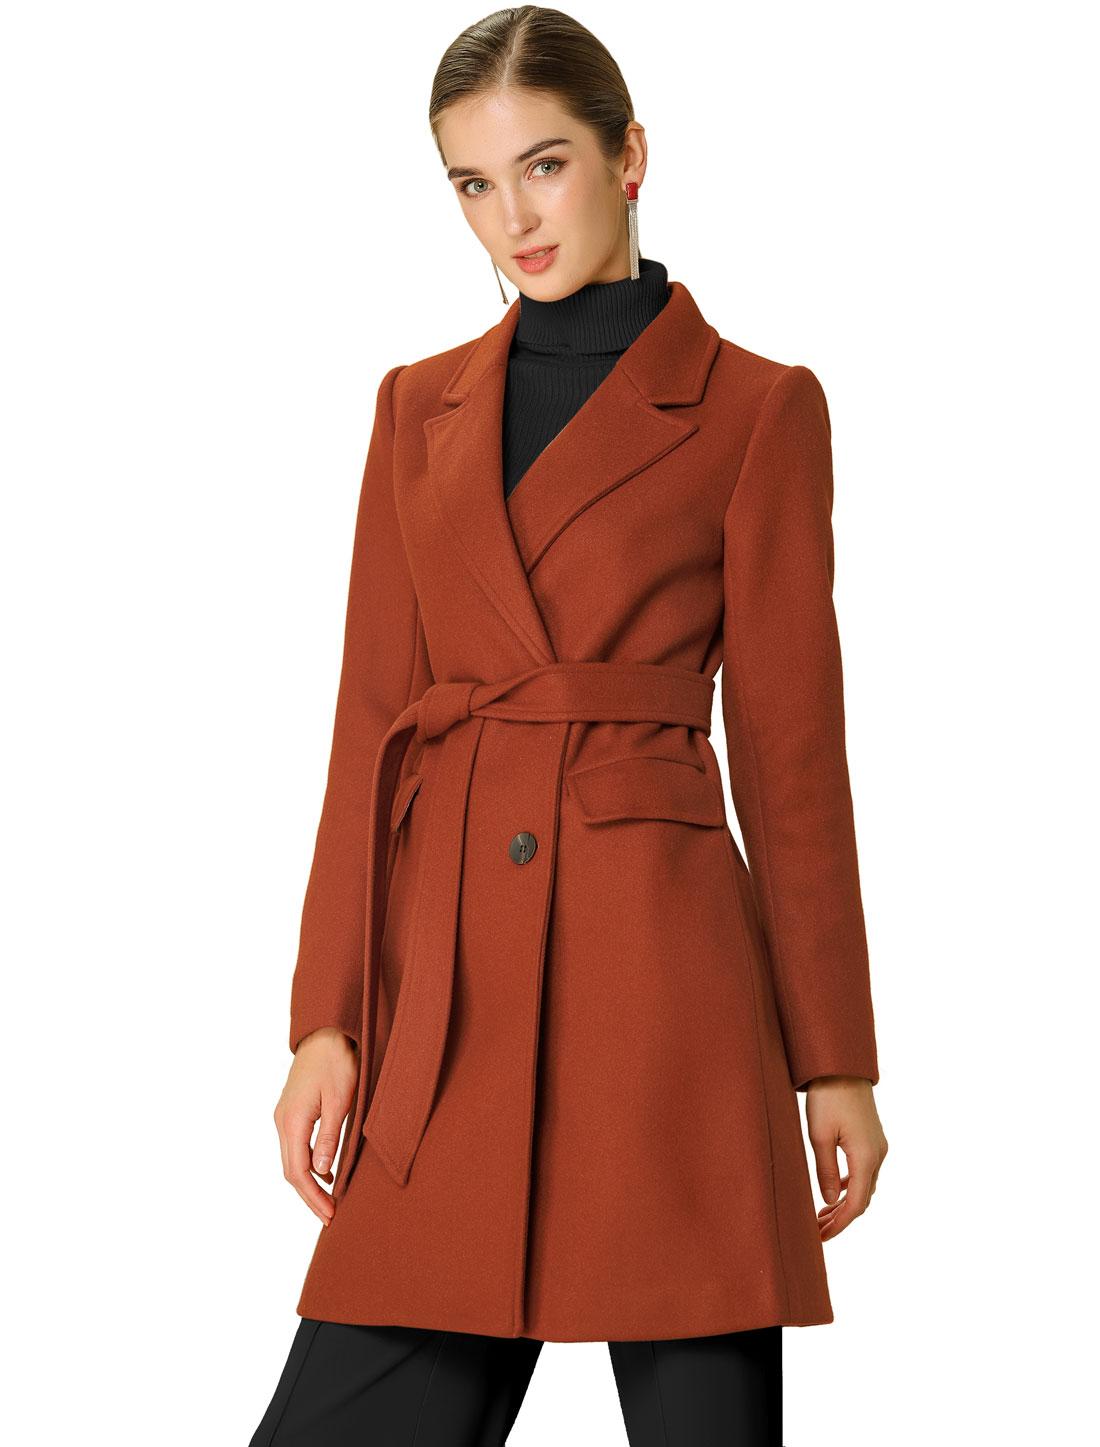 Allegra K Women's button Belt Long Jacket PeaTrench Coat Brick Red L (US 14)